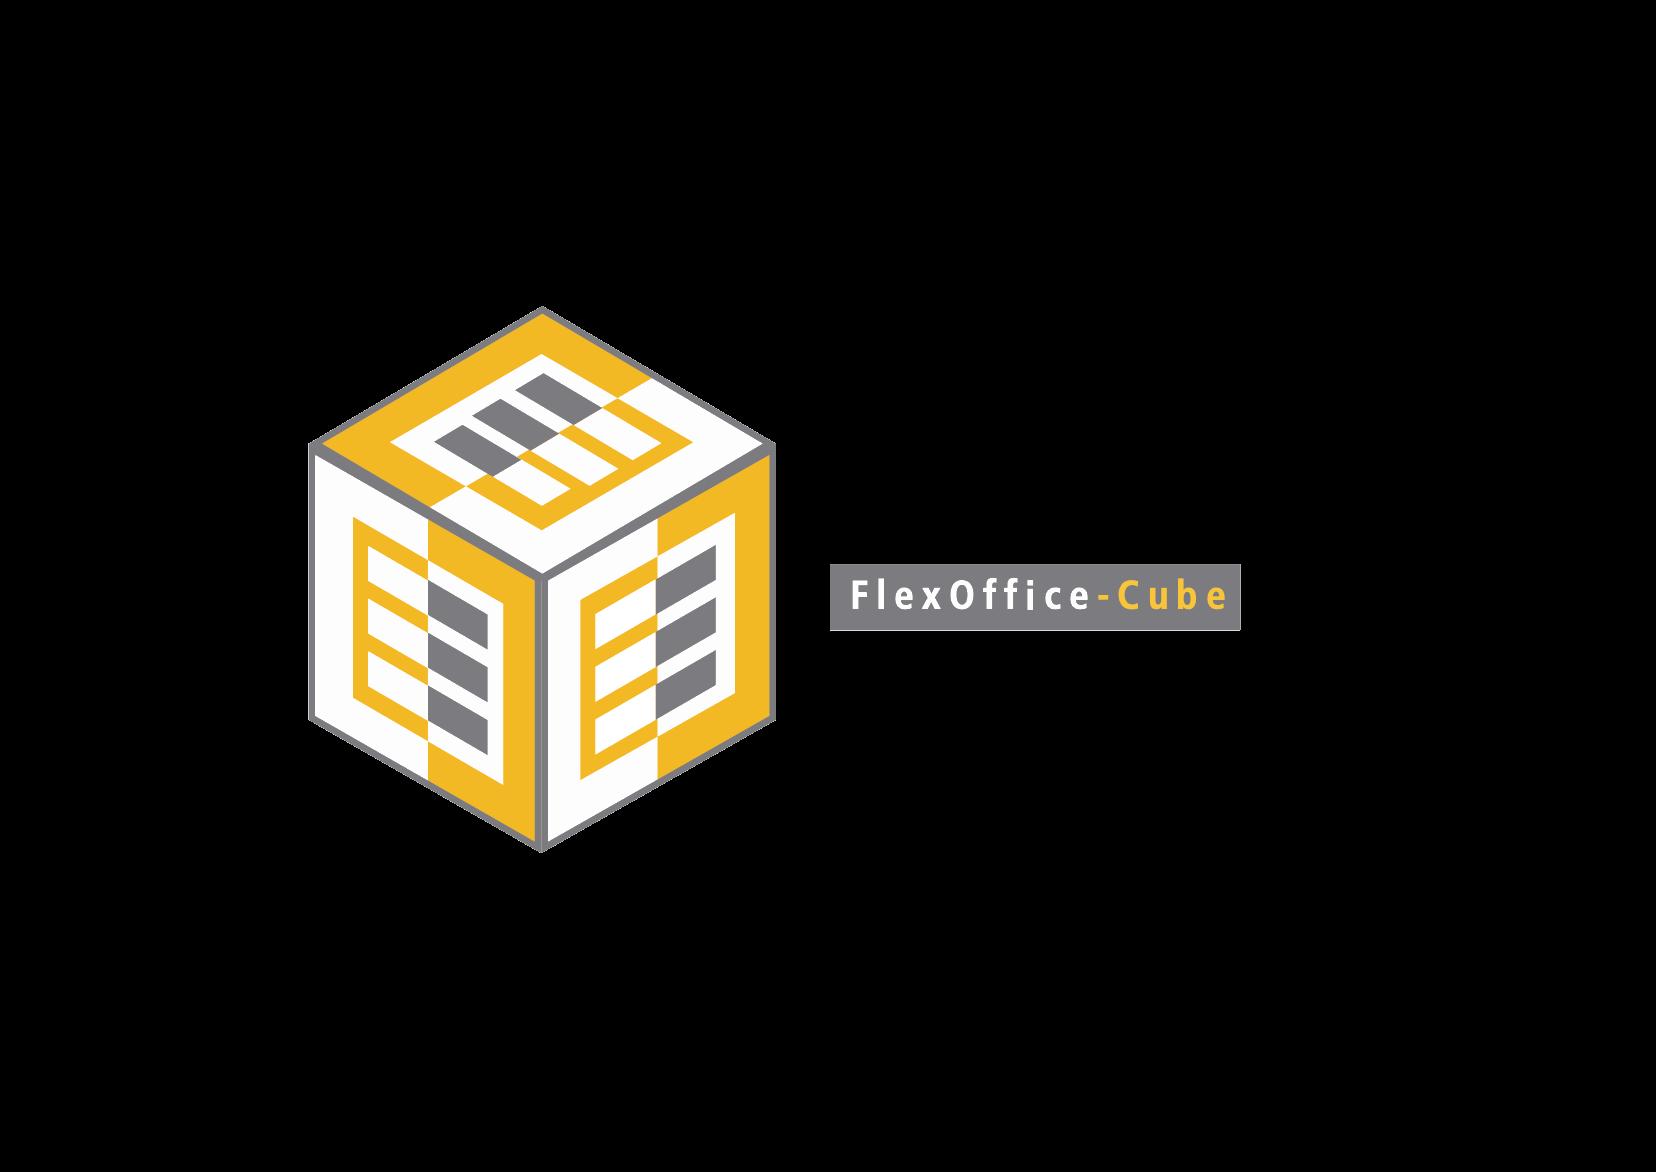 FlexOffice-Cube Logo